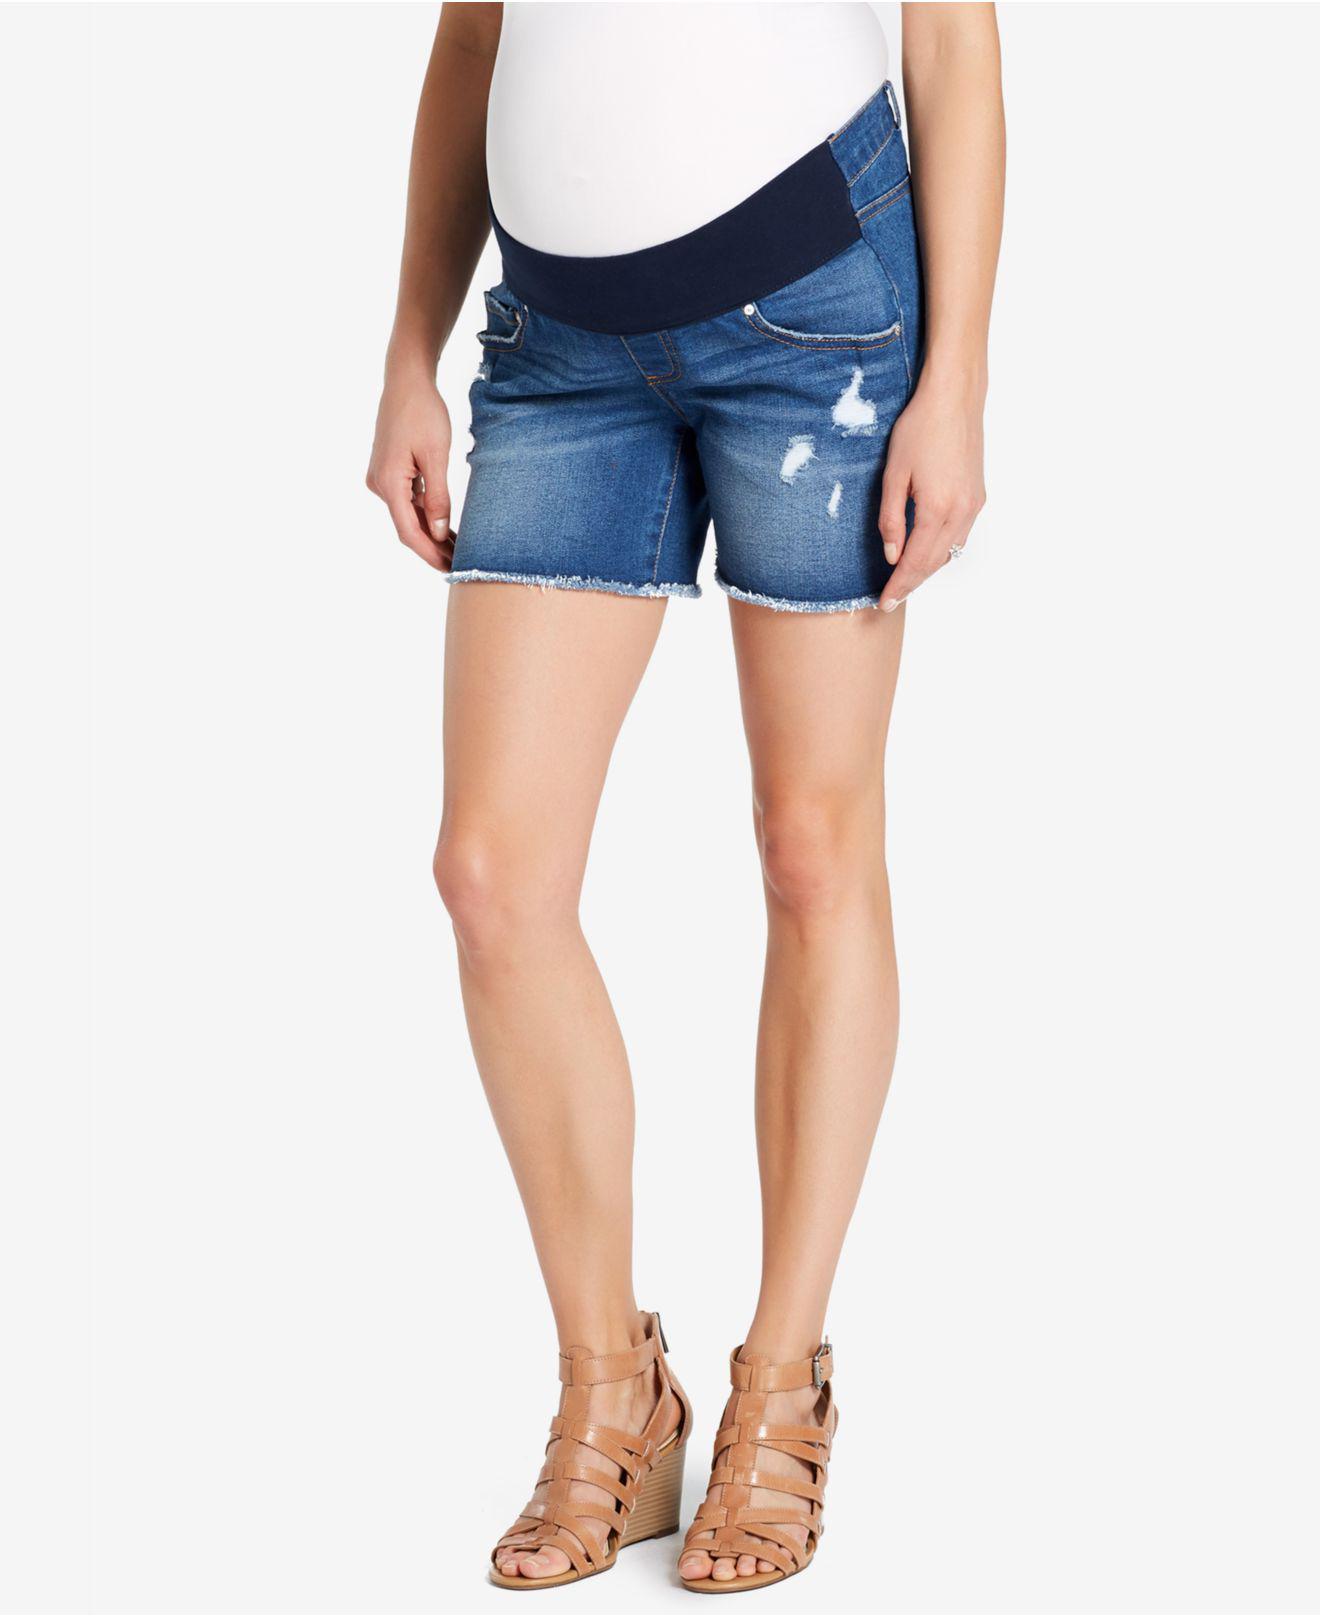 c472295d2f907 Lyst - Jessica Simpson Maternity Frayed-hem Denim Shorts in Blue